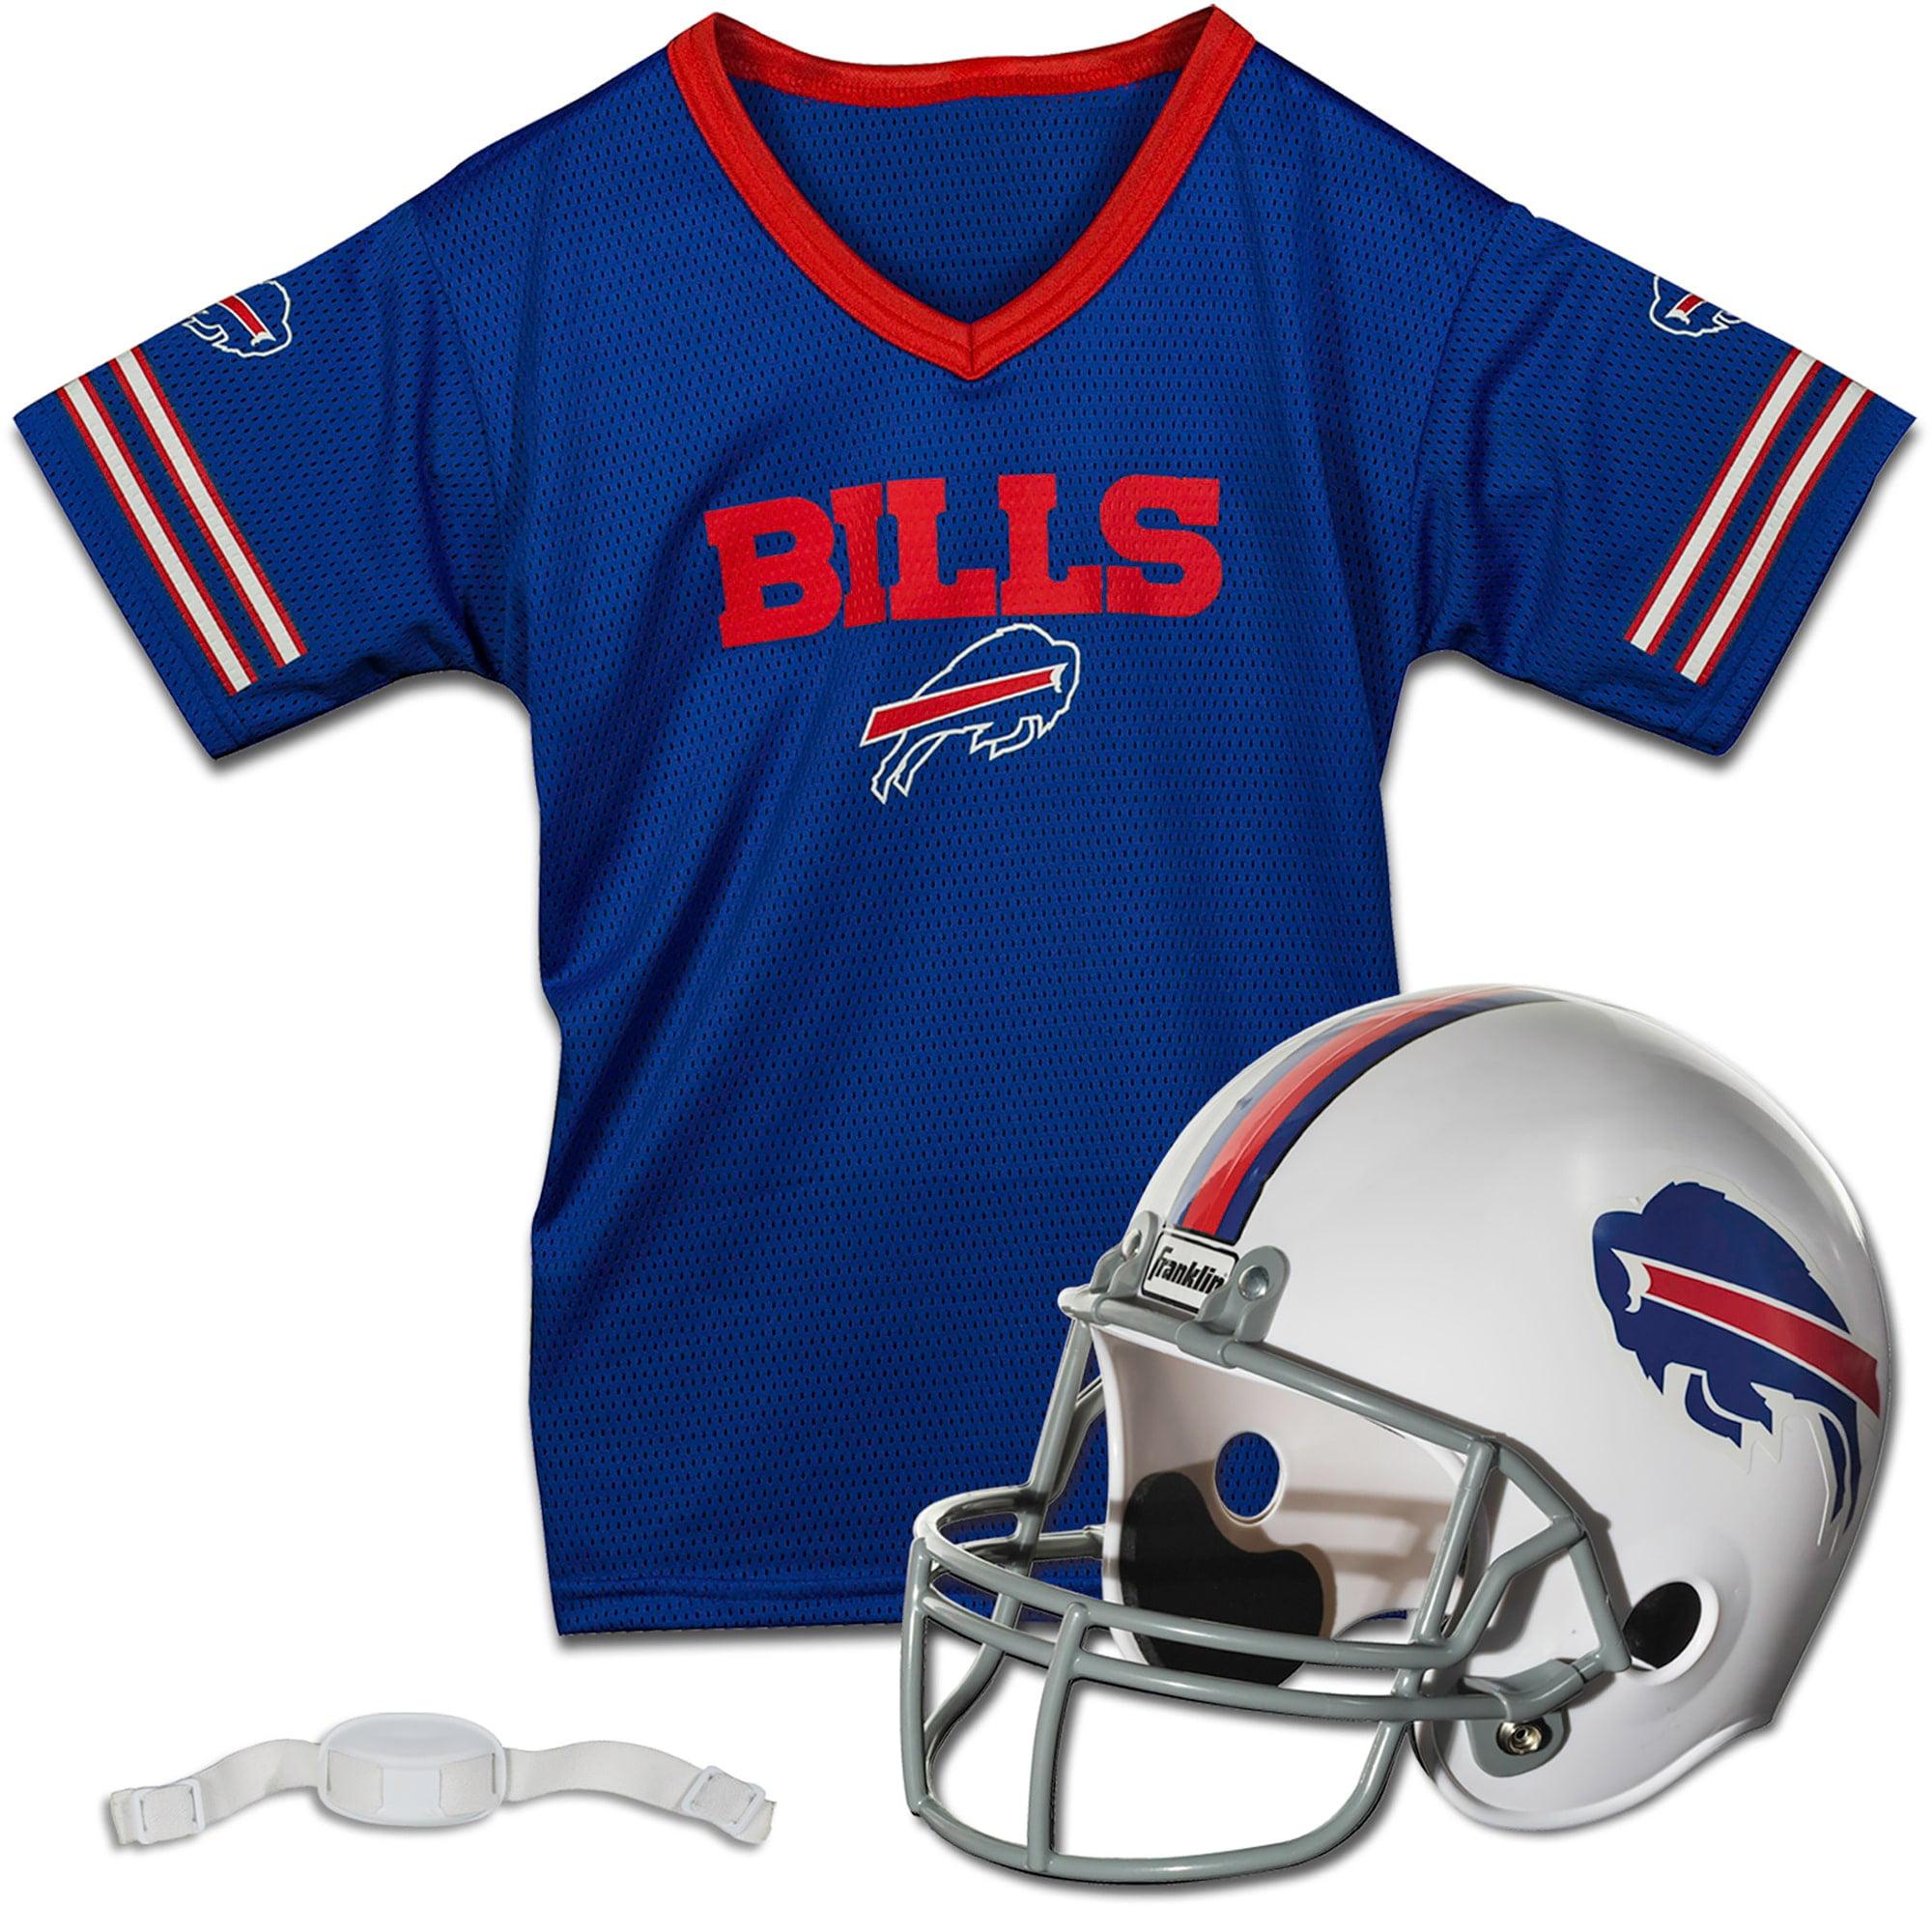 Buffalo Bills Franklin Sports Youth Helmet and Jersey Set